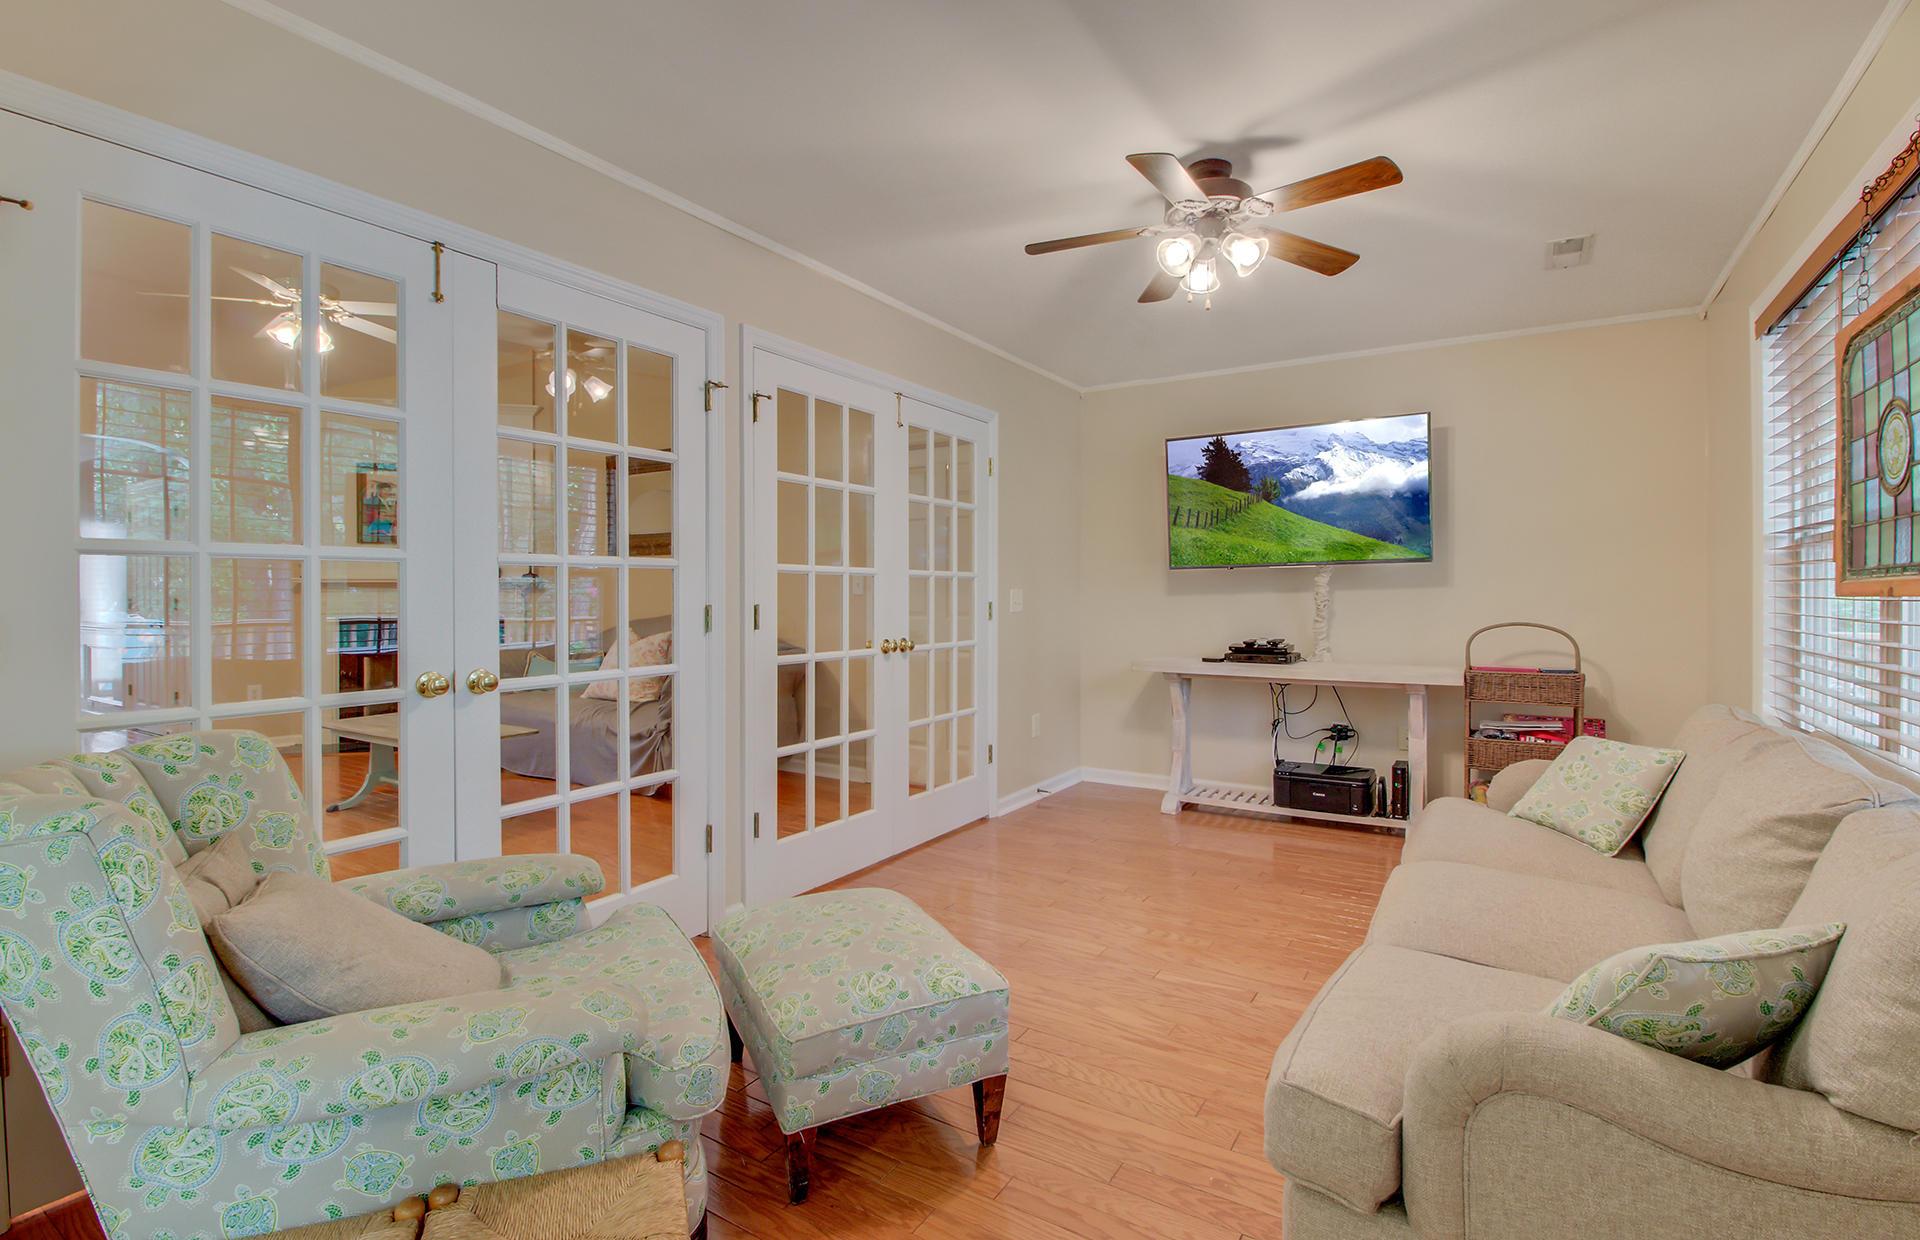 Park West Homes For Sale - 1500 Wellesley, Mount Pleasant, SC - 32